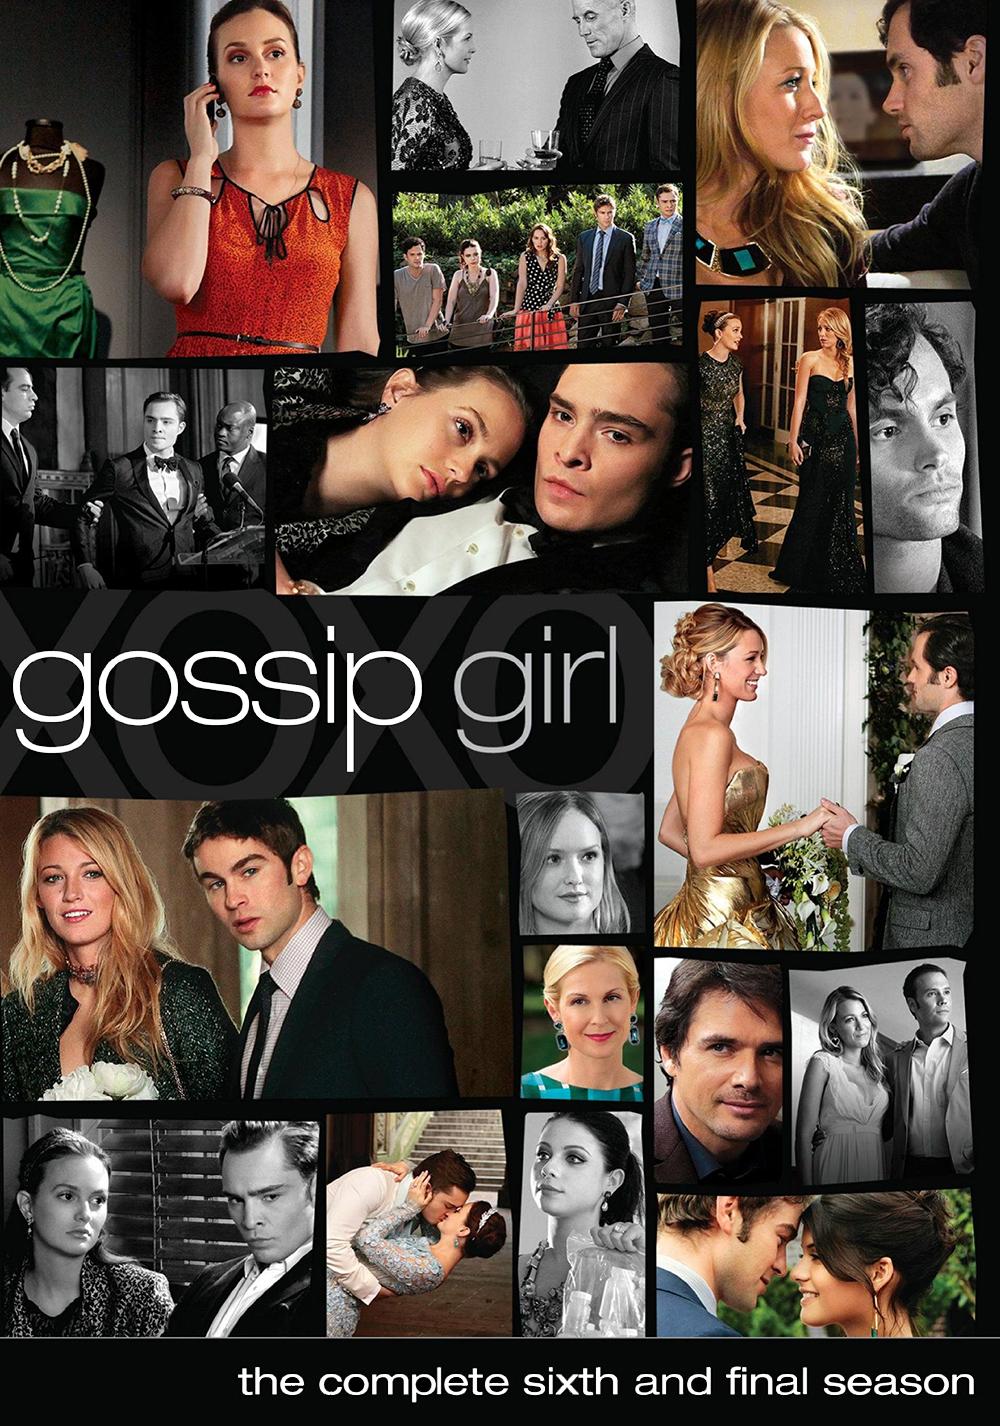 gossip girl stream german